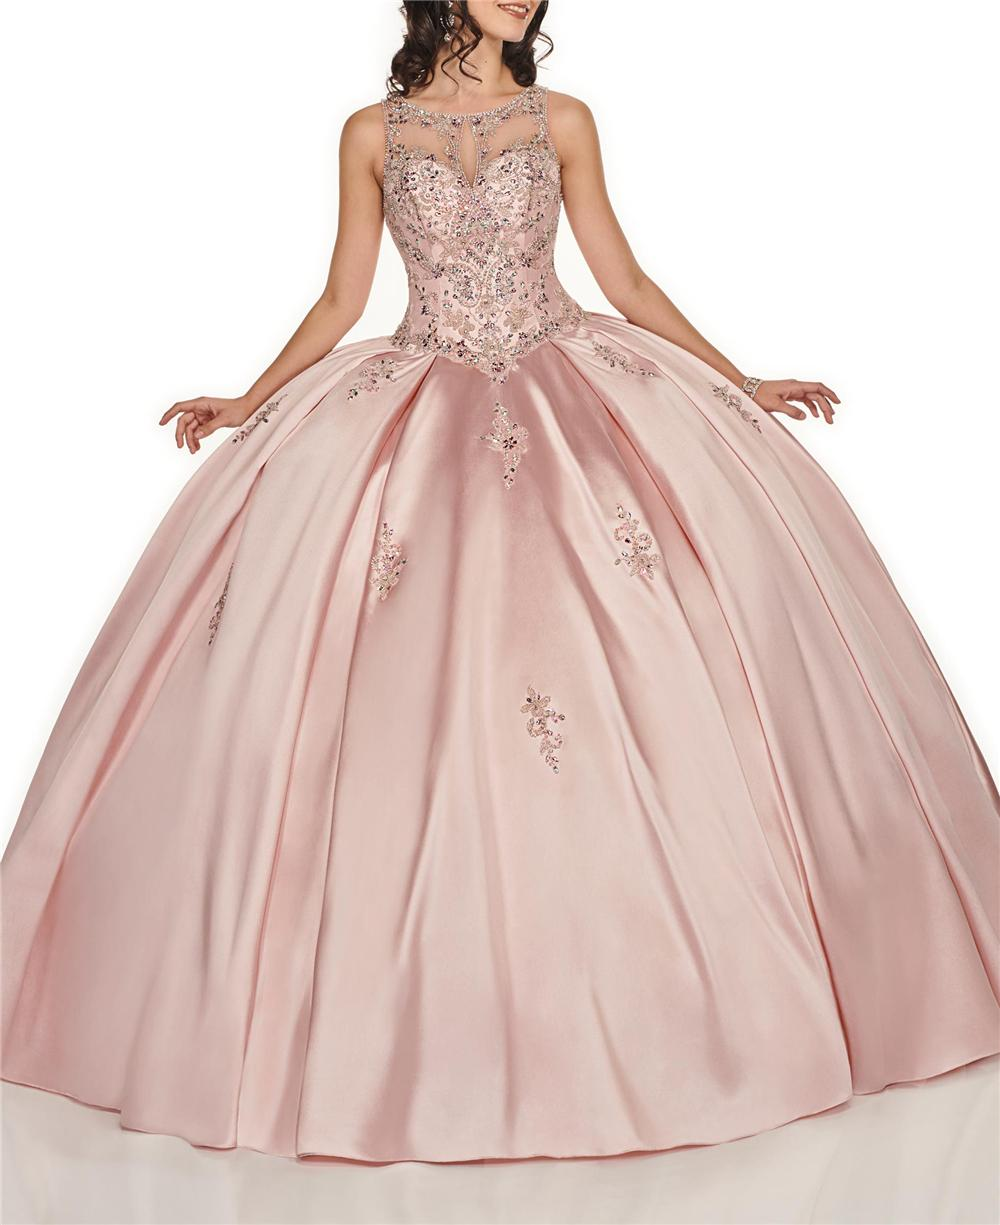 Pink Satin vestidos 15 anos Quinceanera Dresses Scoop Appliques Beading Vintages Lace-Up Backhole Sweet 16 Quinceanera Dresses